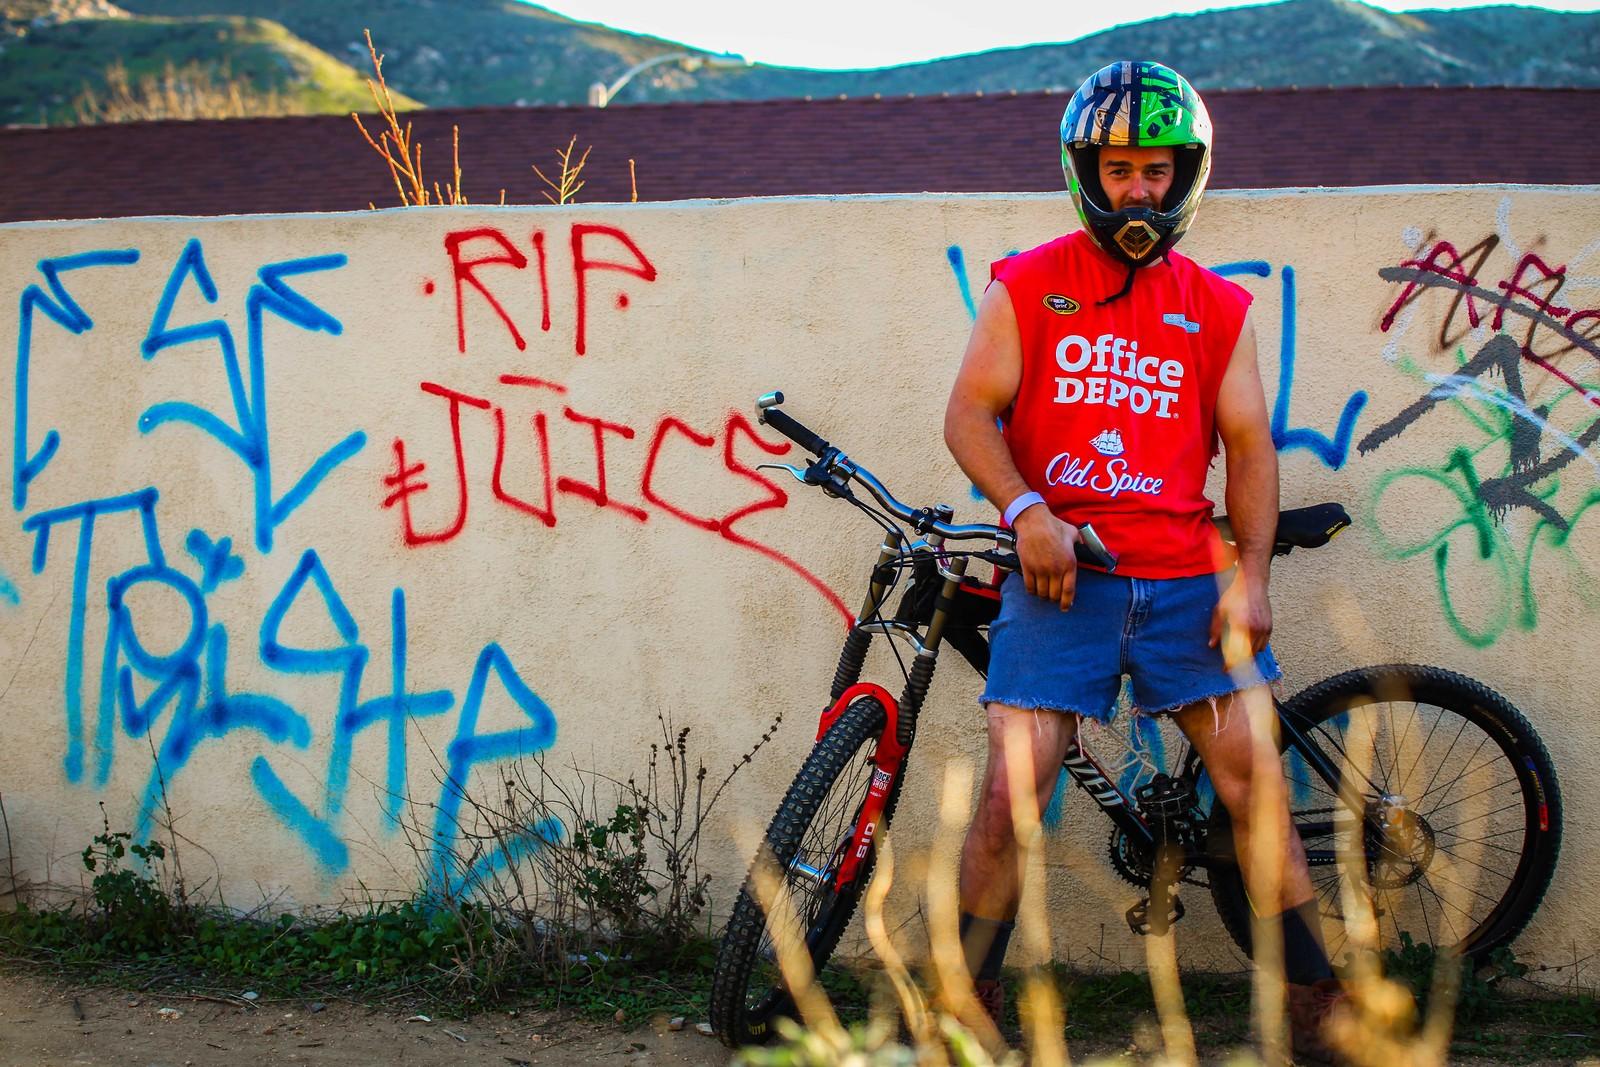 Randy ready for practice - GnarHuck - Mountain Biking Pictures - Vital MTB